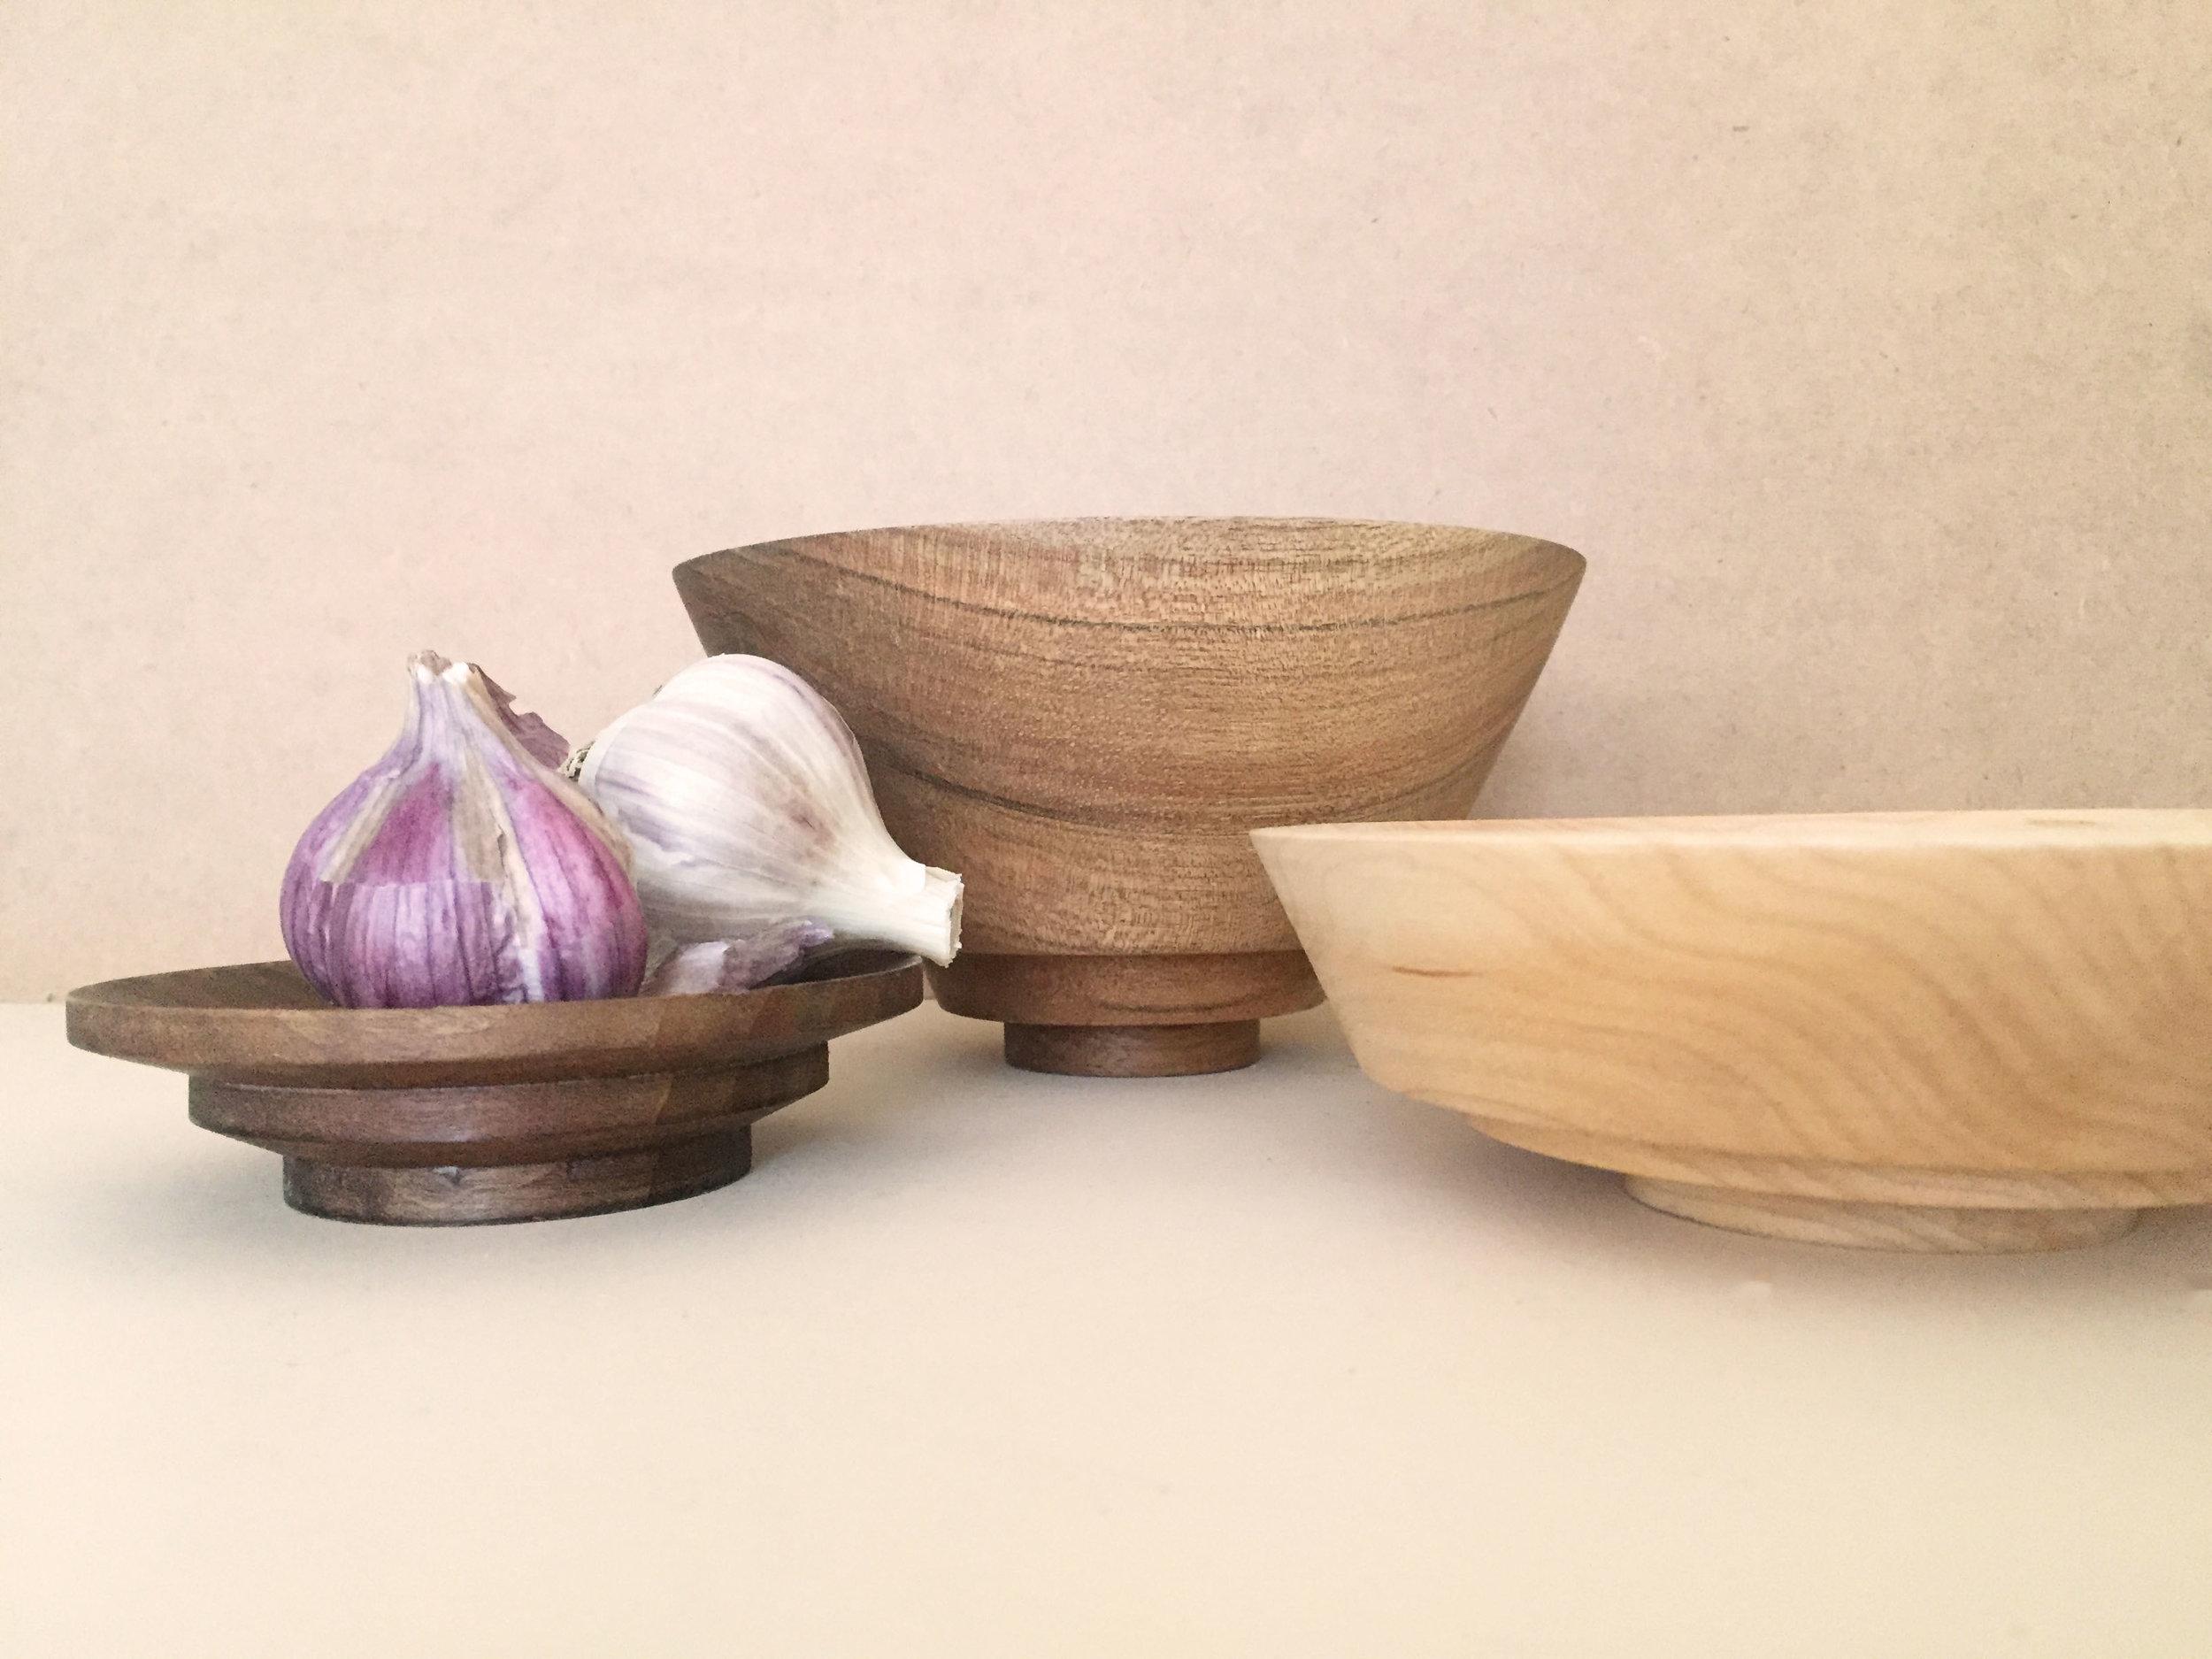 bowls2.jpg